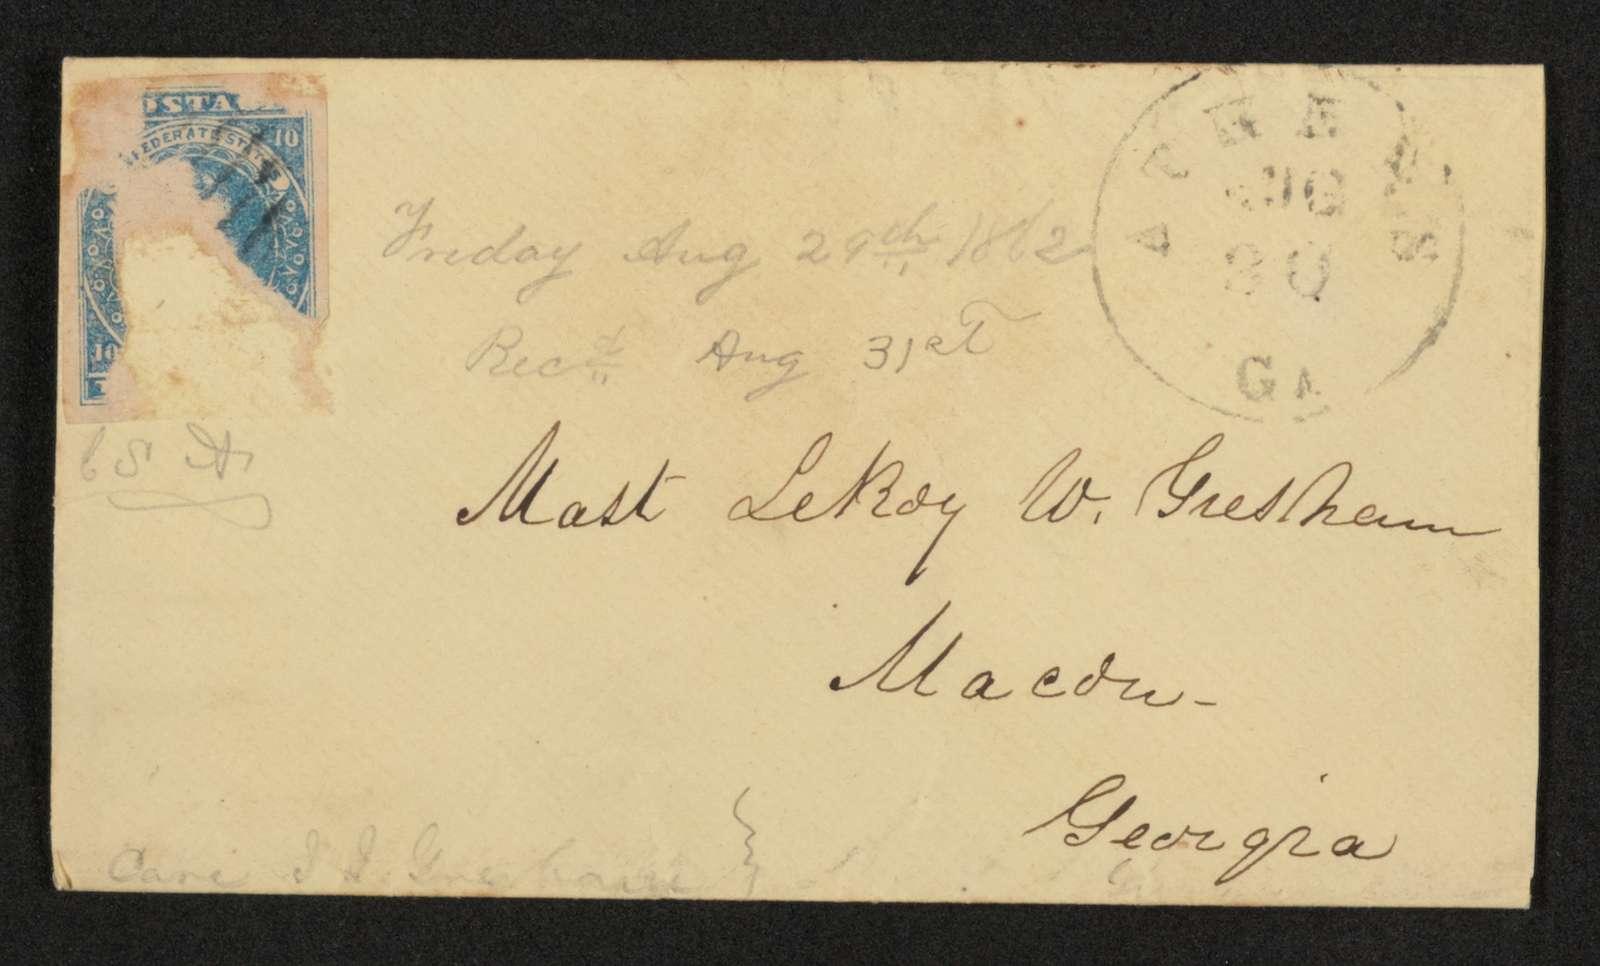 Lewis H. Machen Family Papers: Gresham Family Correspondence, 1834-1925; 1862-1863